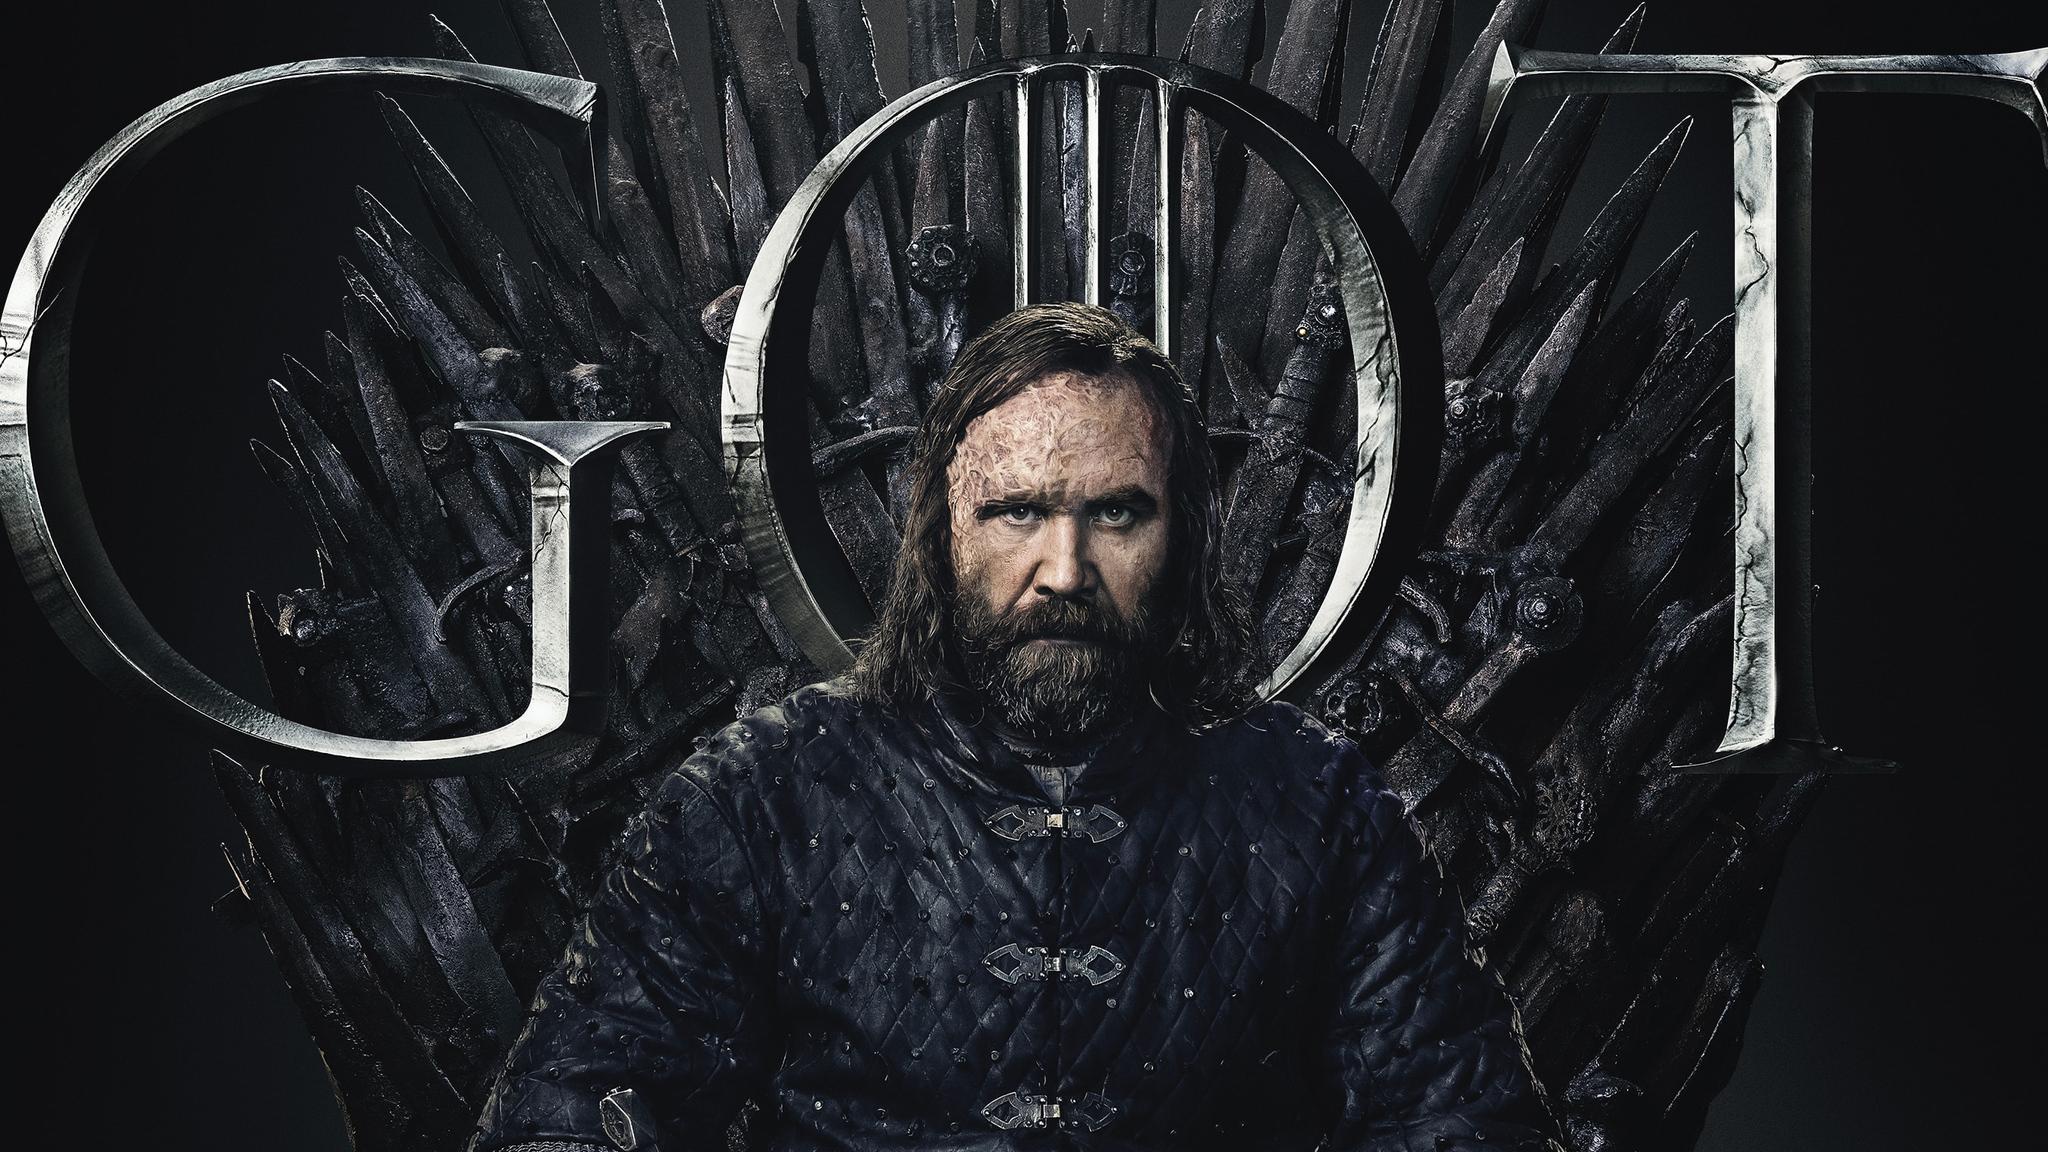 2048x1152 Sandor Clegane Hound Game Of Thrones Season 8 ...